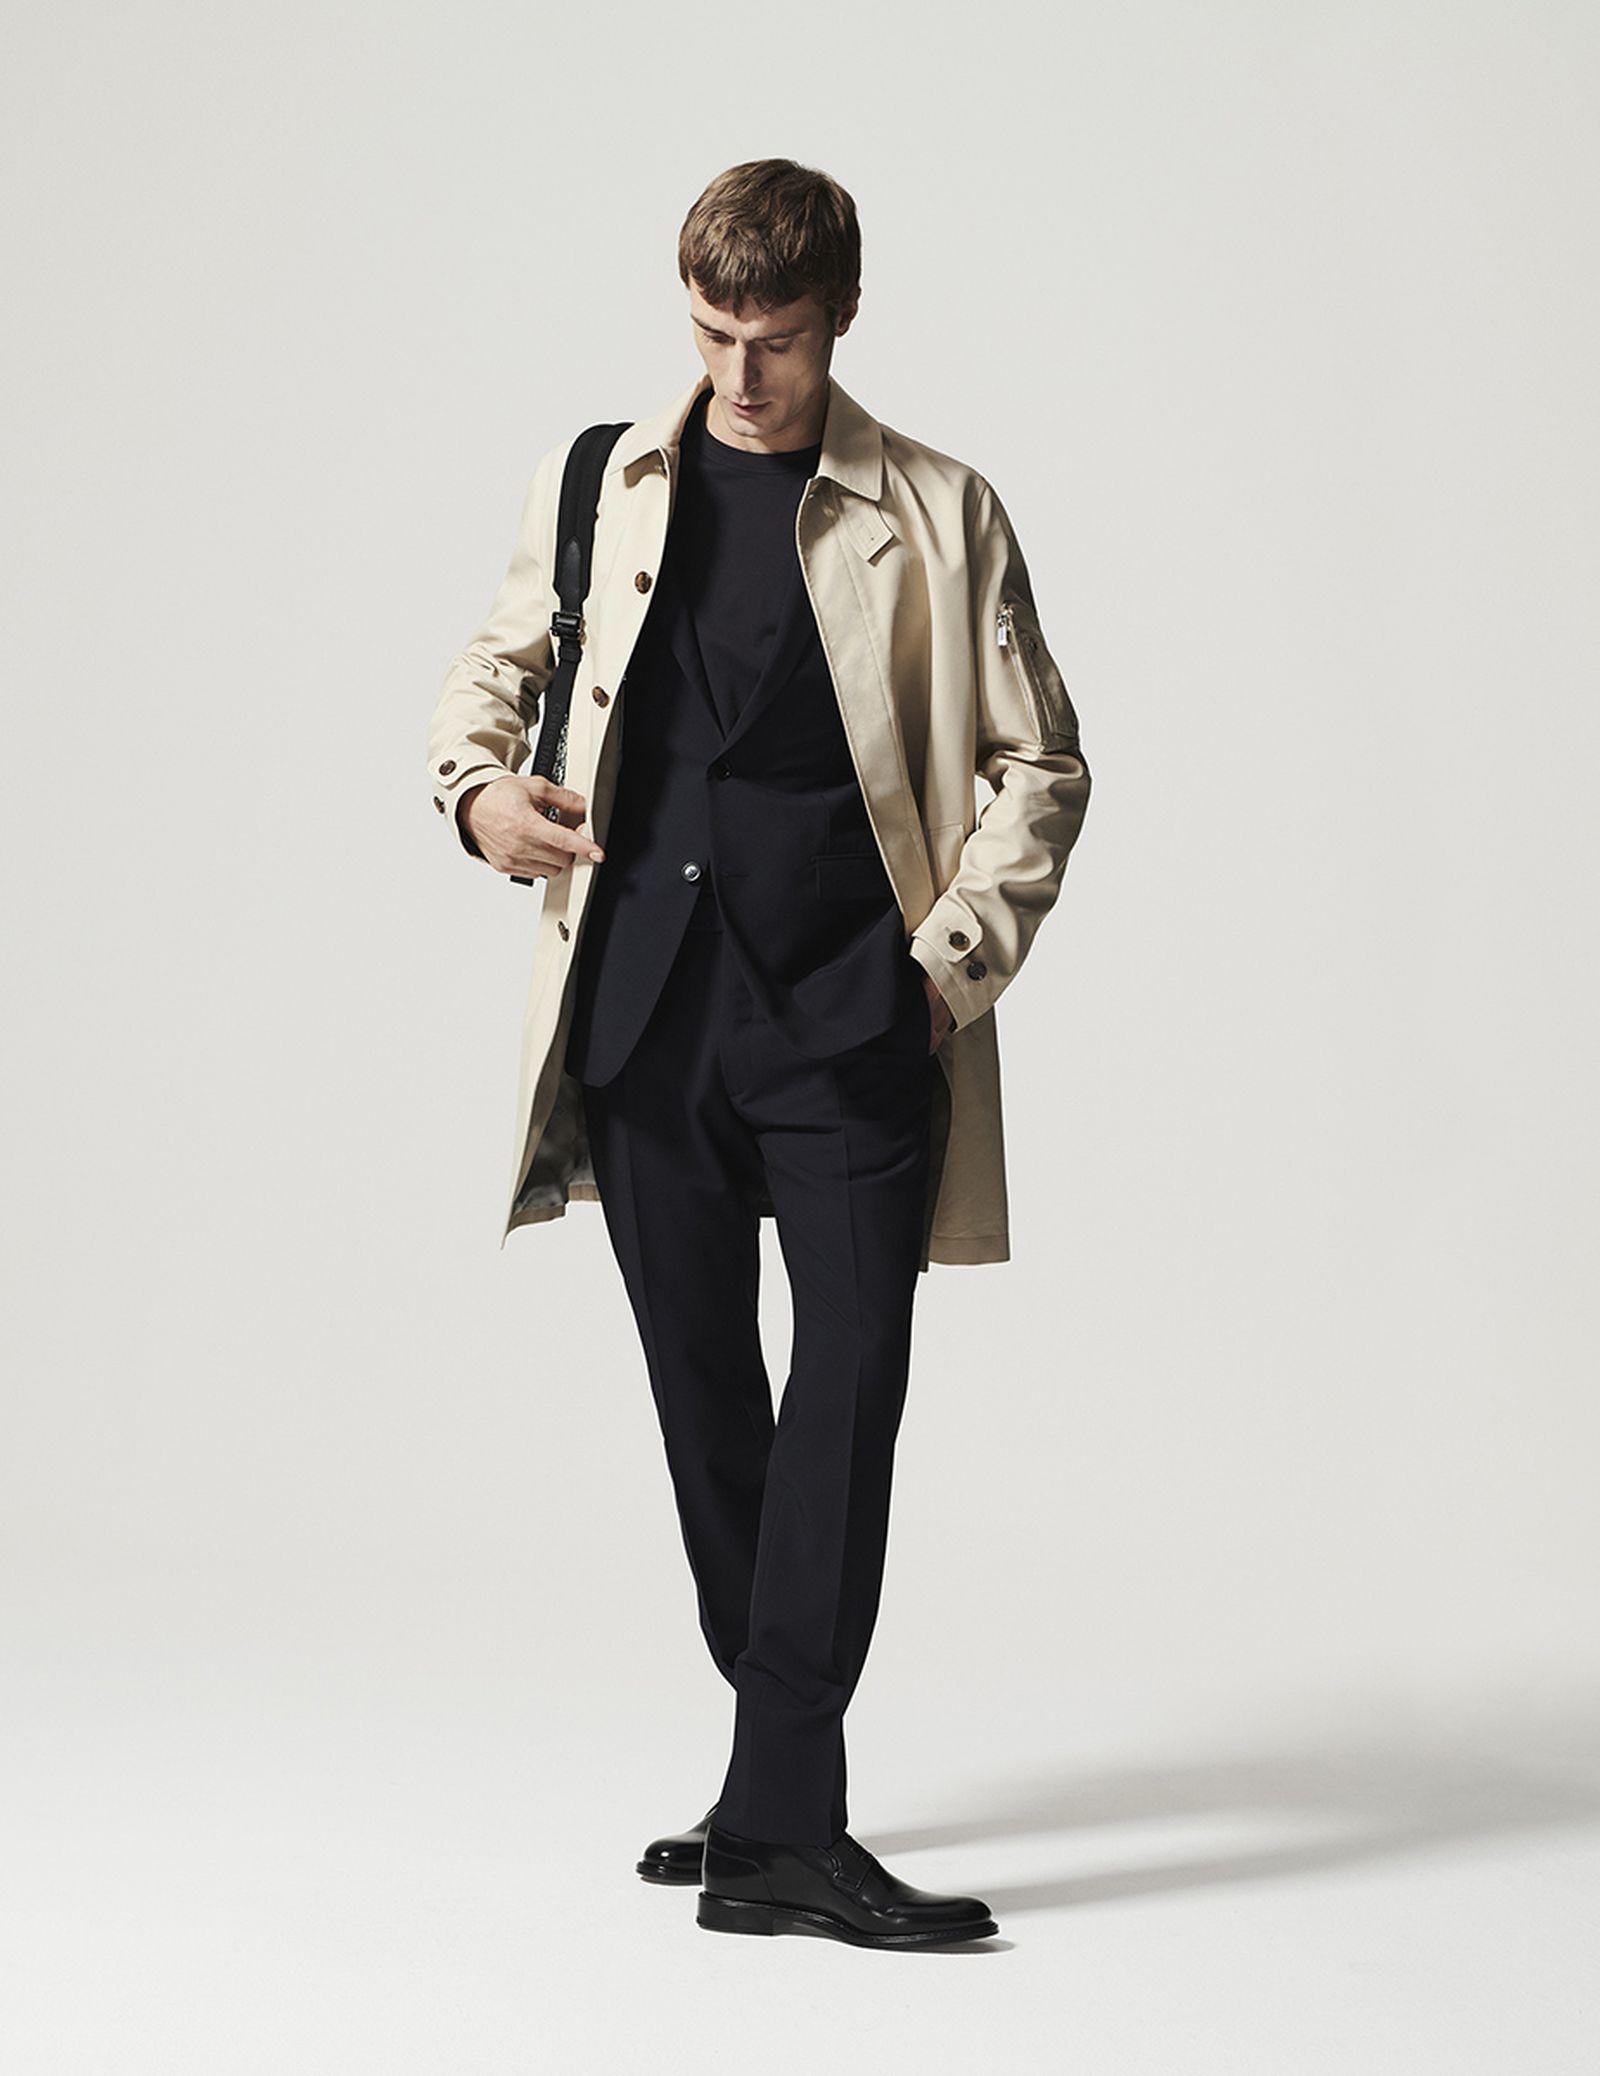 Dior Essentials men's line